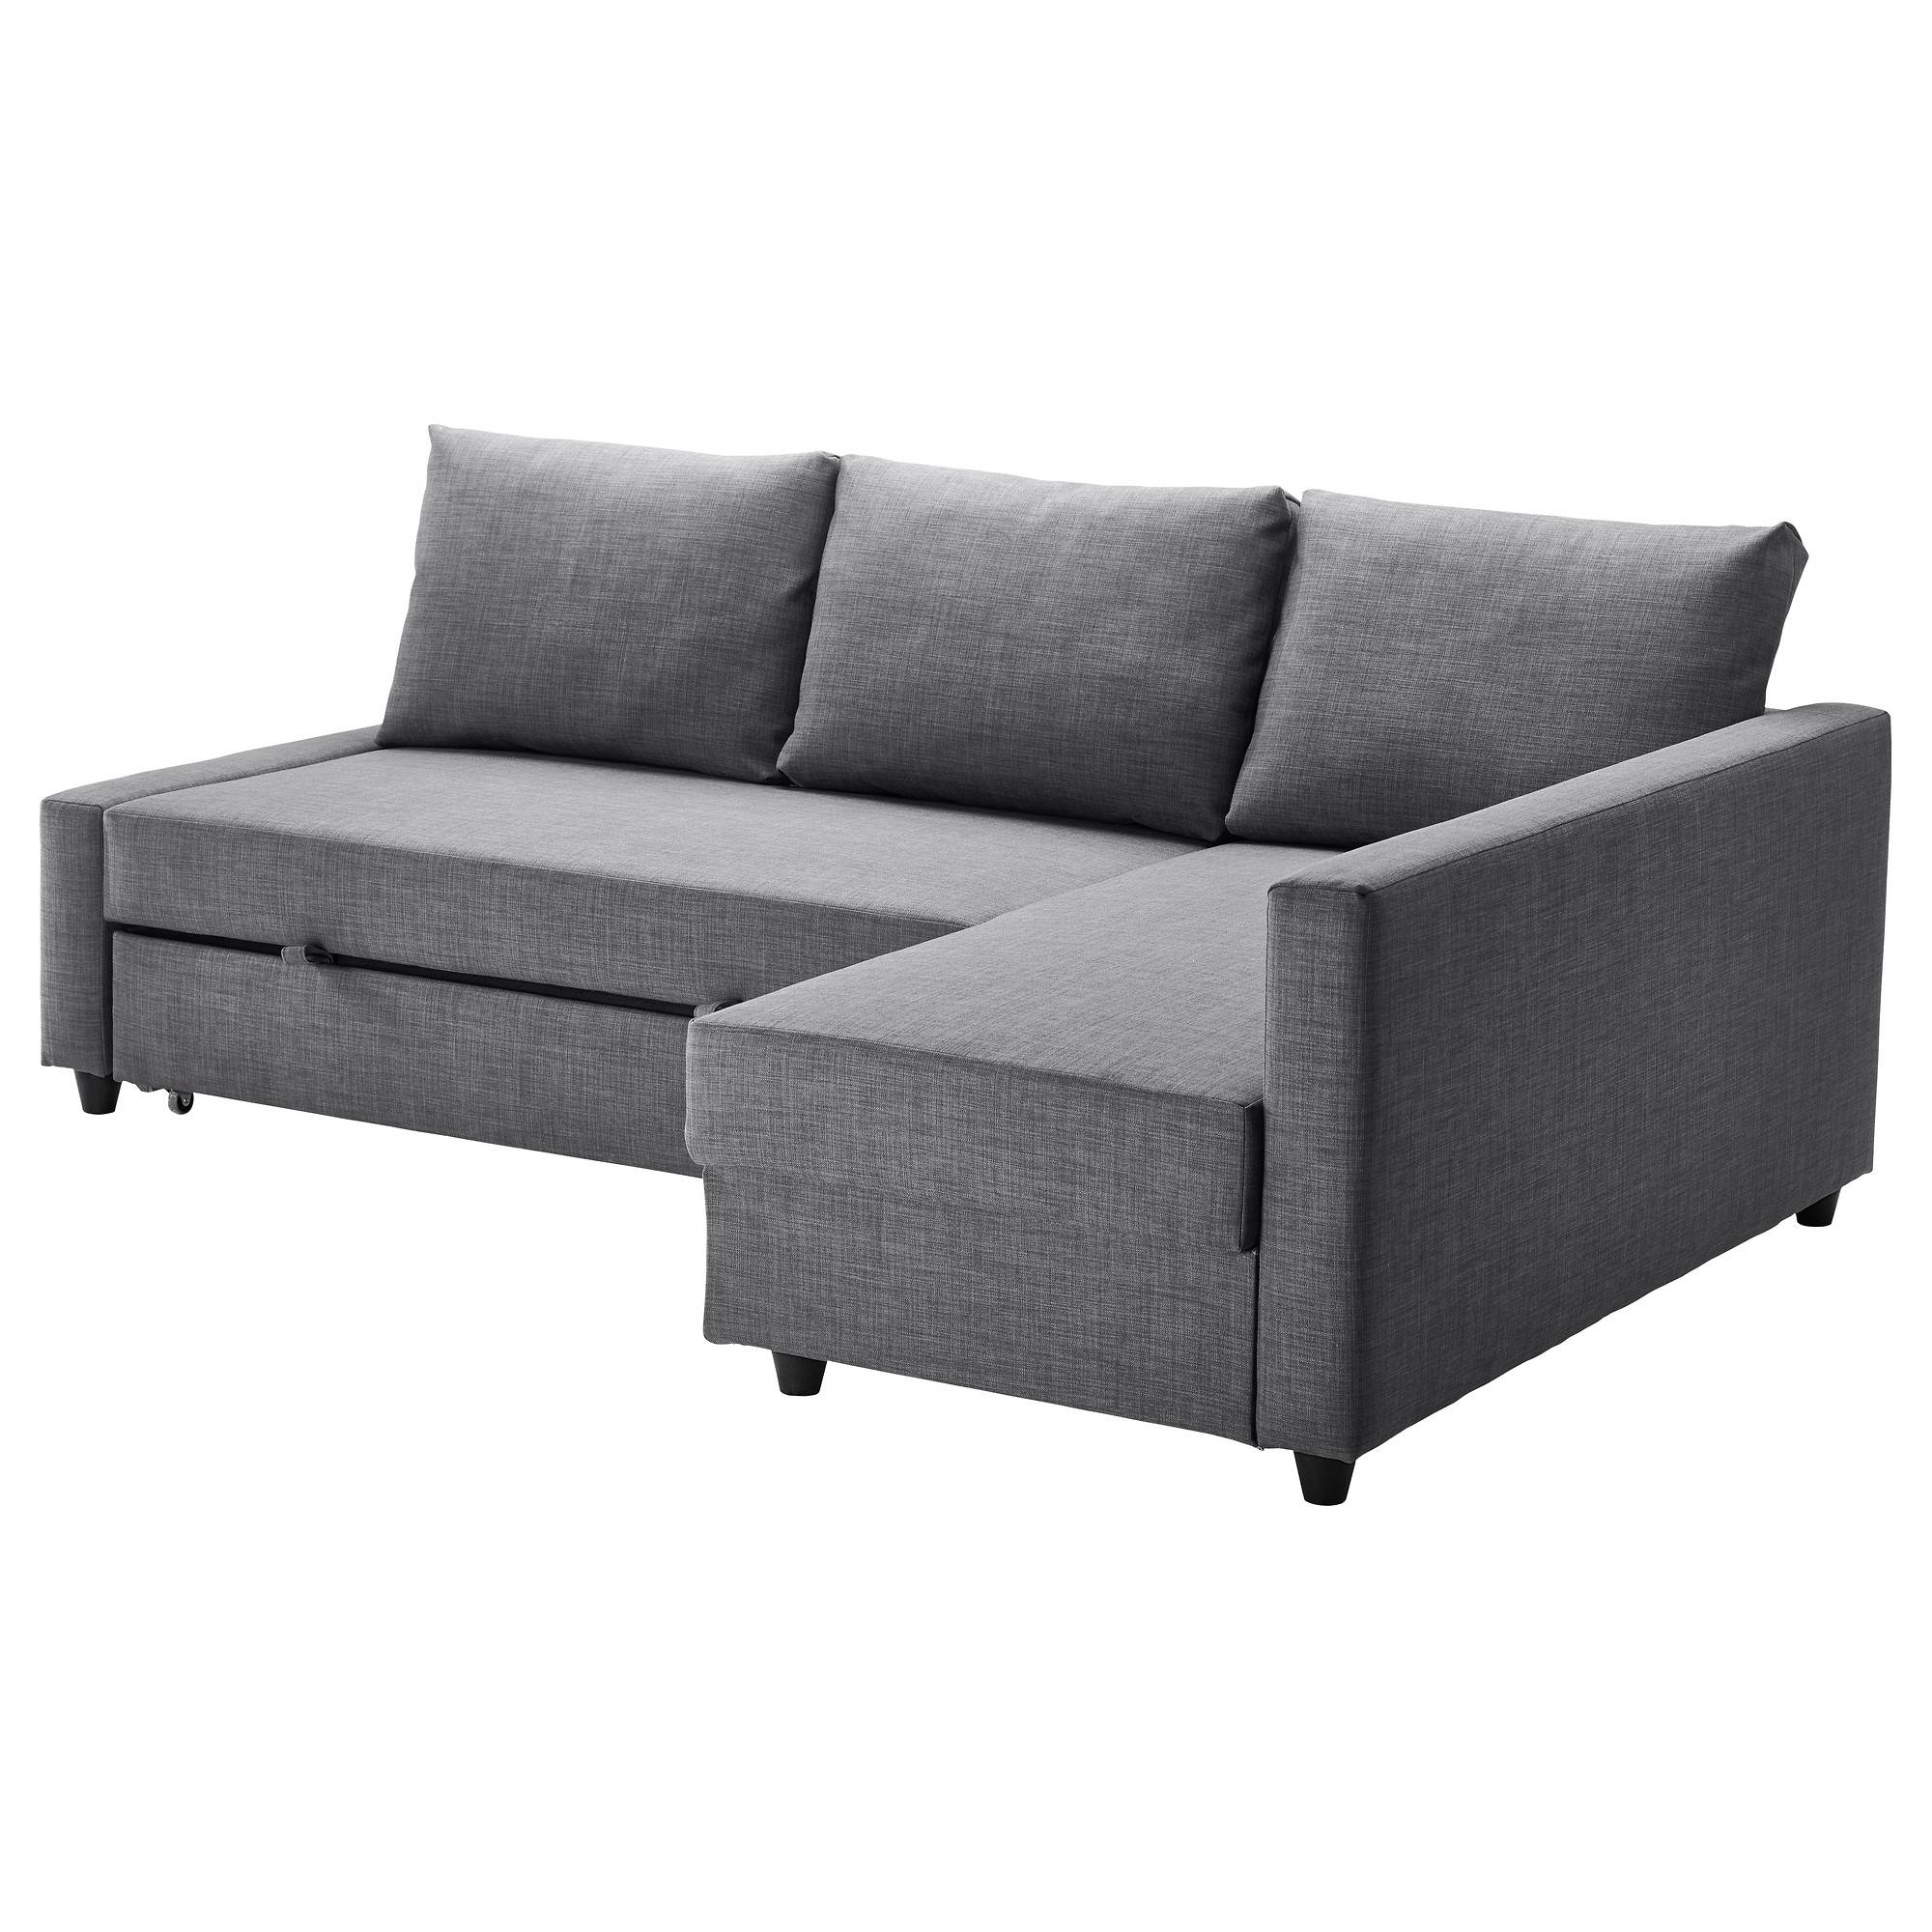 Friheten Corner Sofa-Bed With Storage Skiftebo Dark Grey - Ikea regarding Corner Sofa Bed With Storage Ikea (Image 12 of 30)